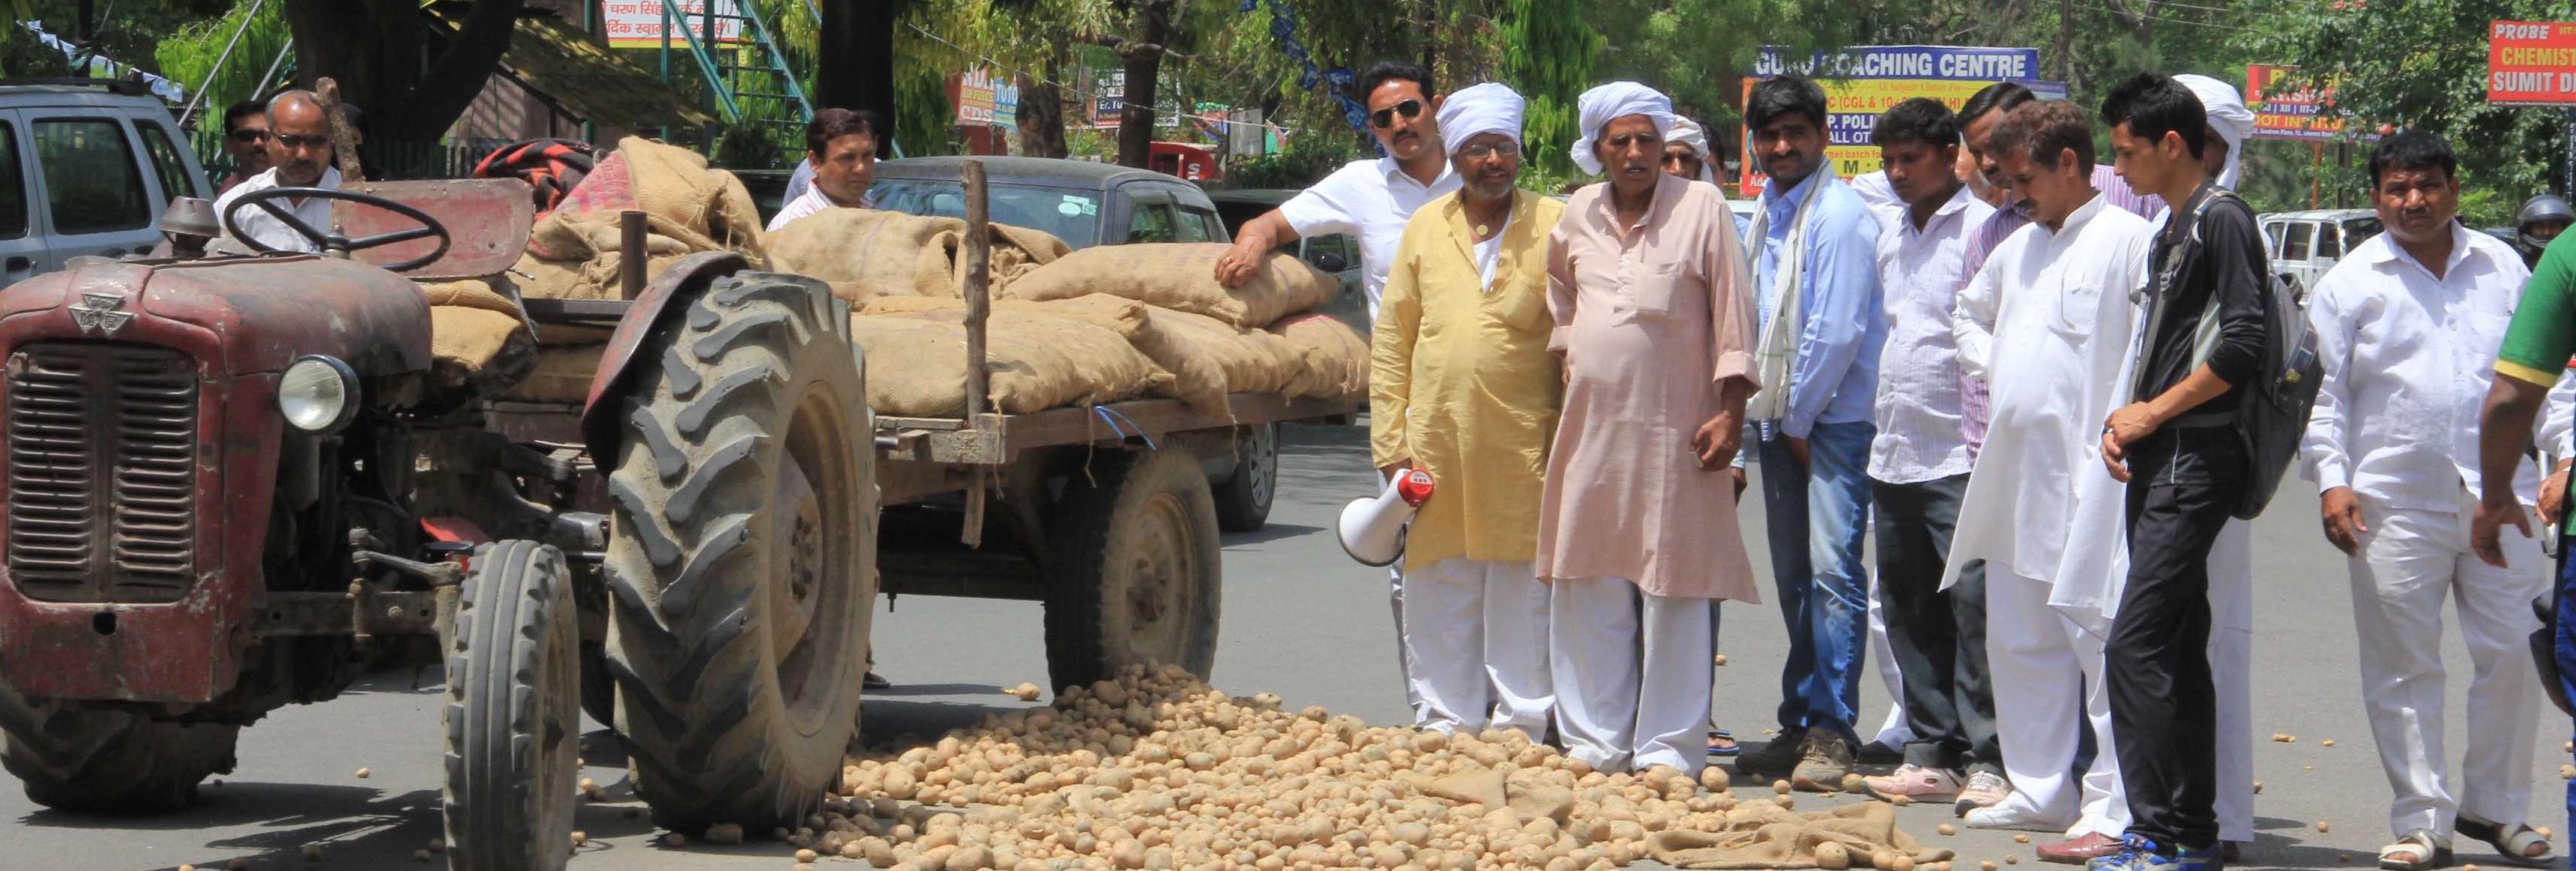 Uttar Pradesh's Hot Potato: Another Farm Crisis Ignored